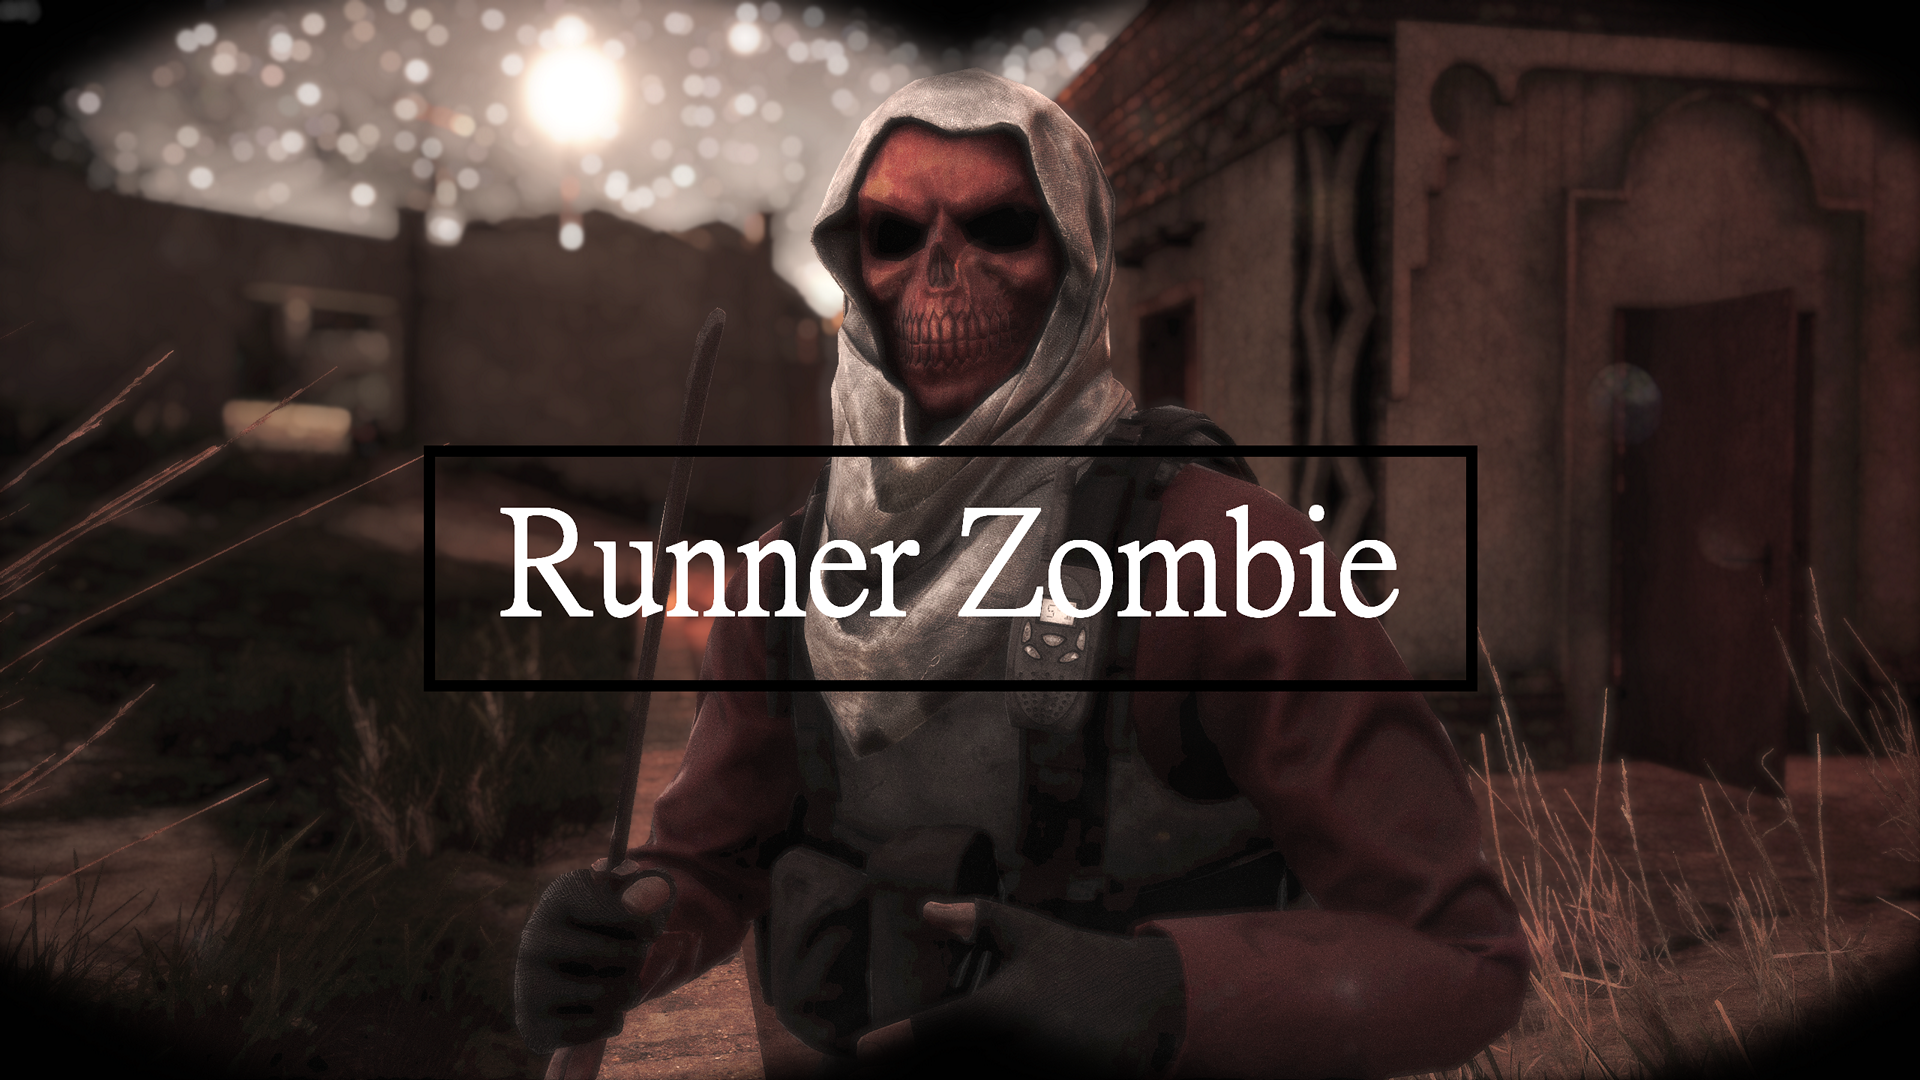 runnerzombie